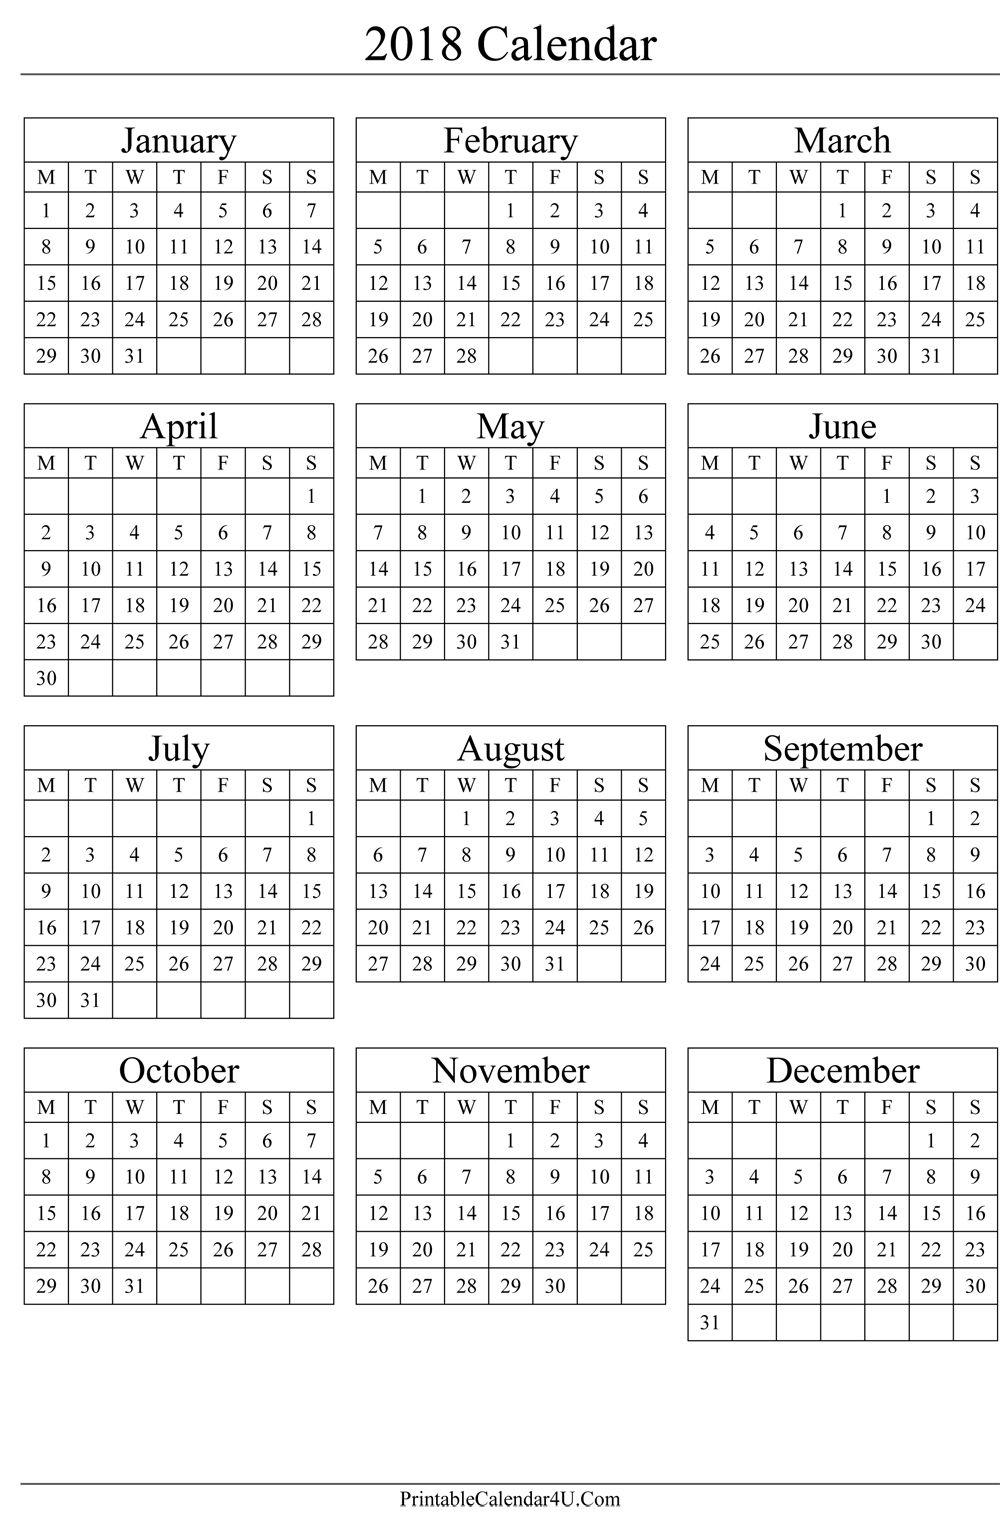 Pin By Calendar Printable On 2018 Calendar In 2018 Calendar